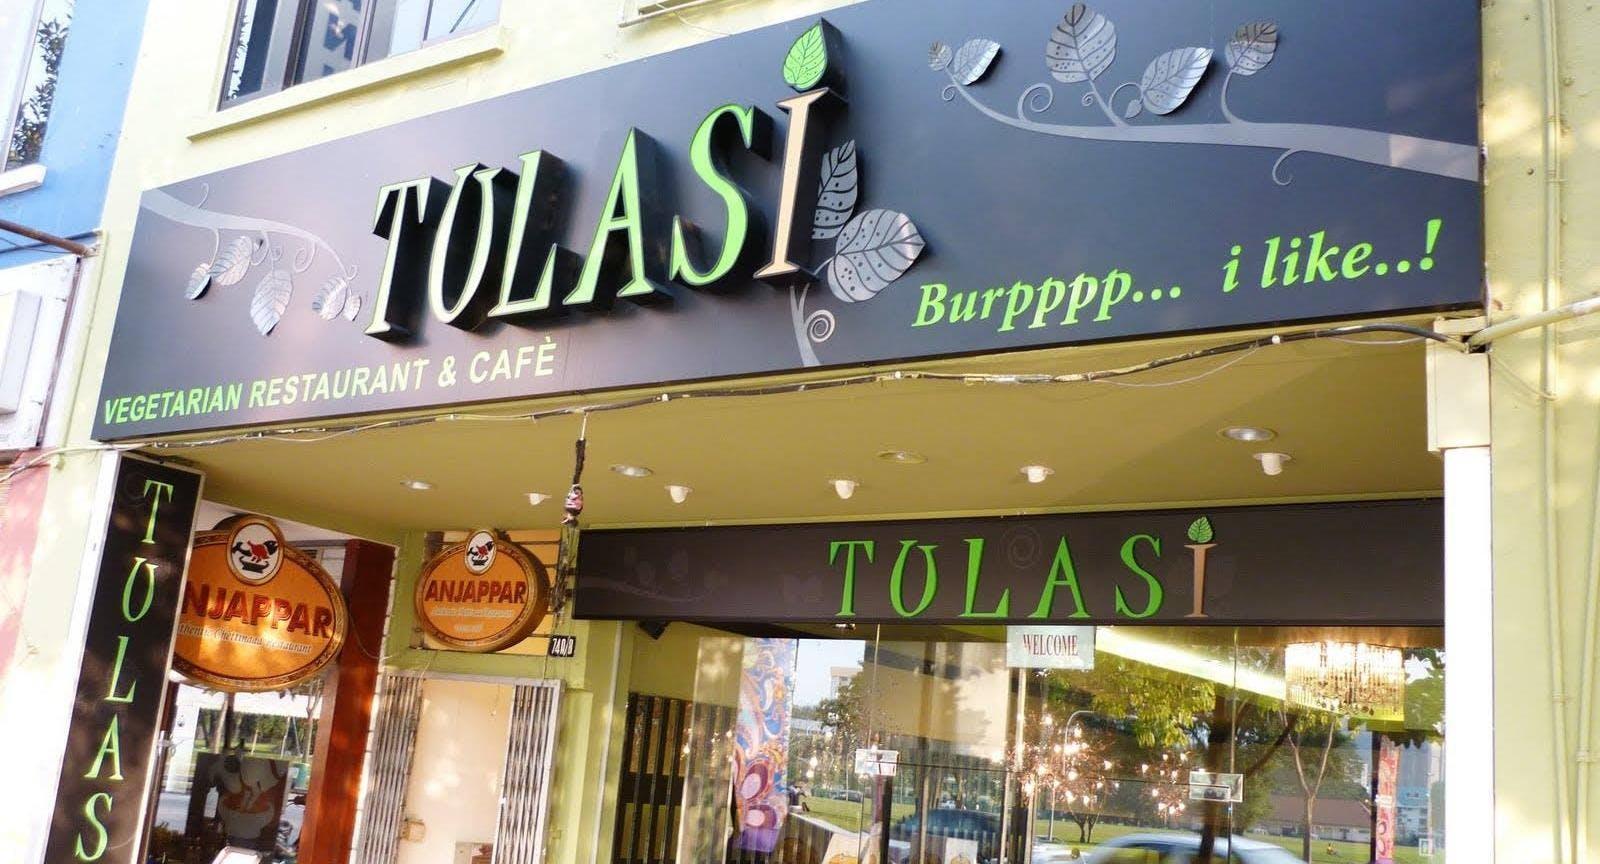 Tulasi Vegetarian Restaurant & Cafe Singapore image 2